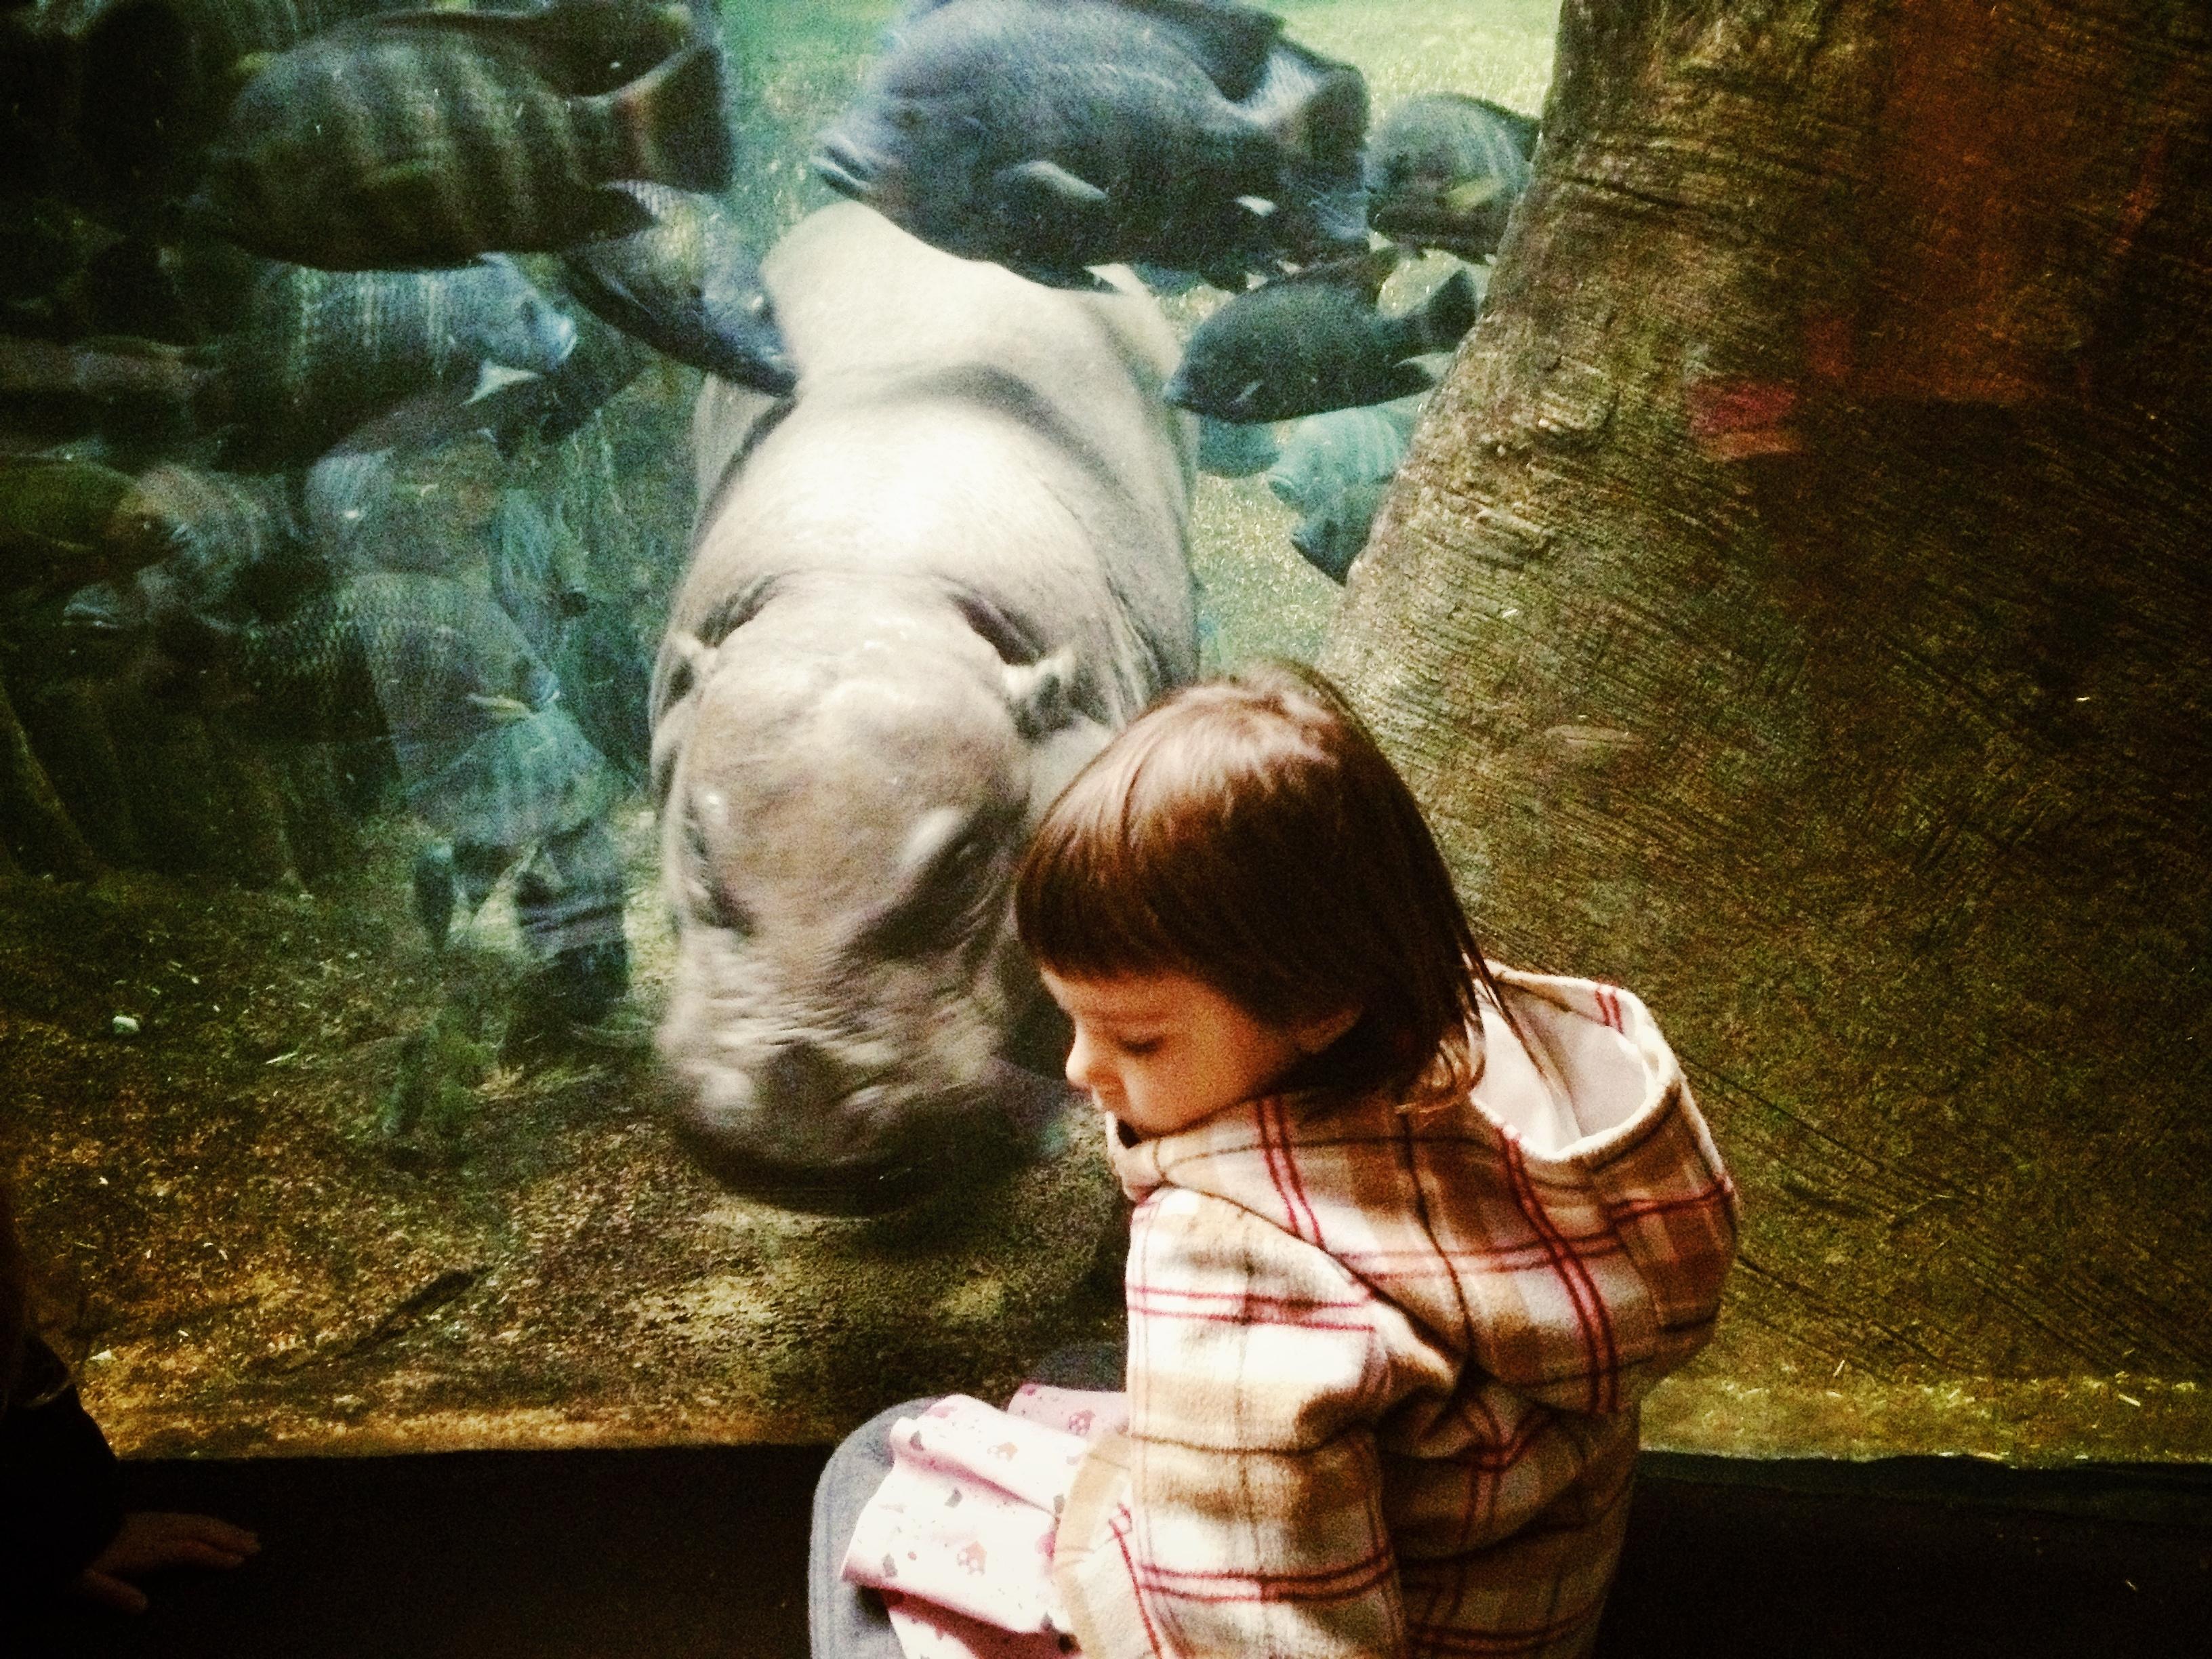 Chicago Zoo